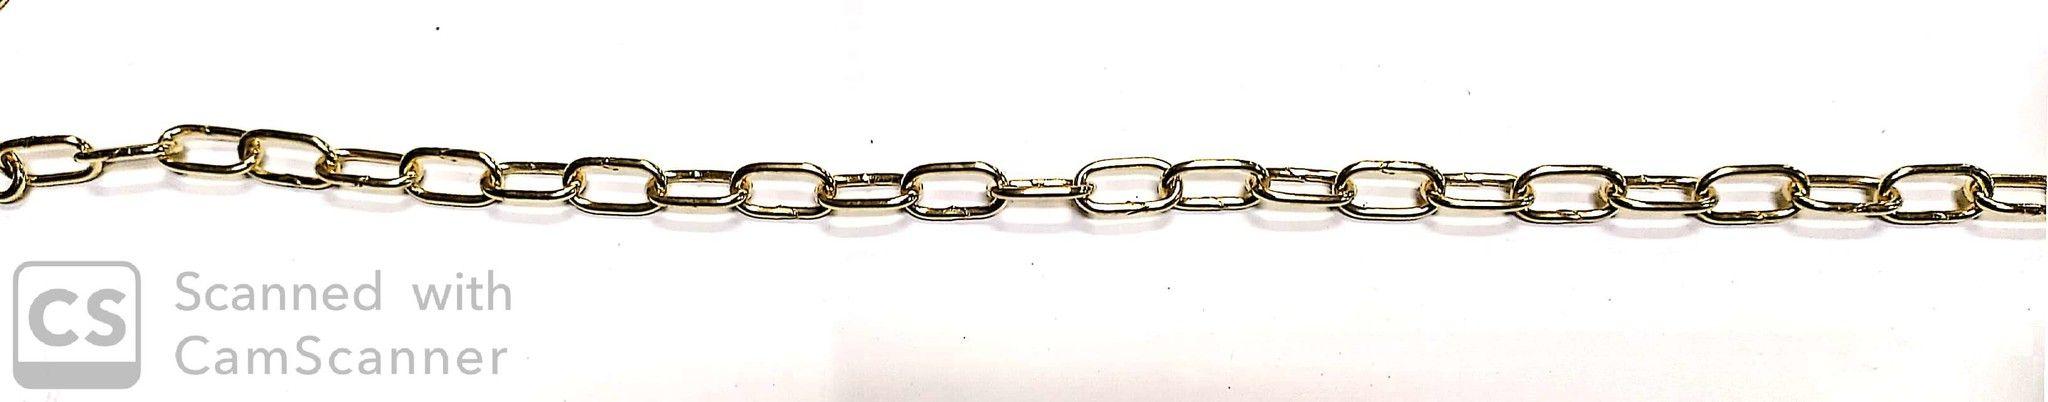 Catena GENOVESE n.14 ottonata anello mm 20,5x10,5 spessore 2,2